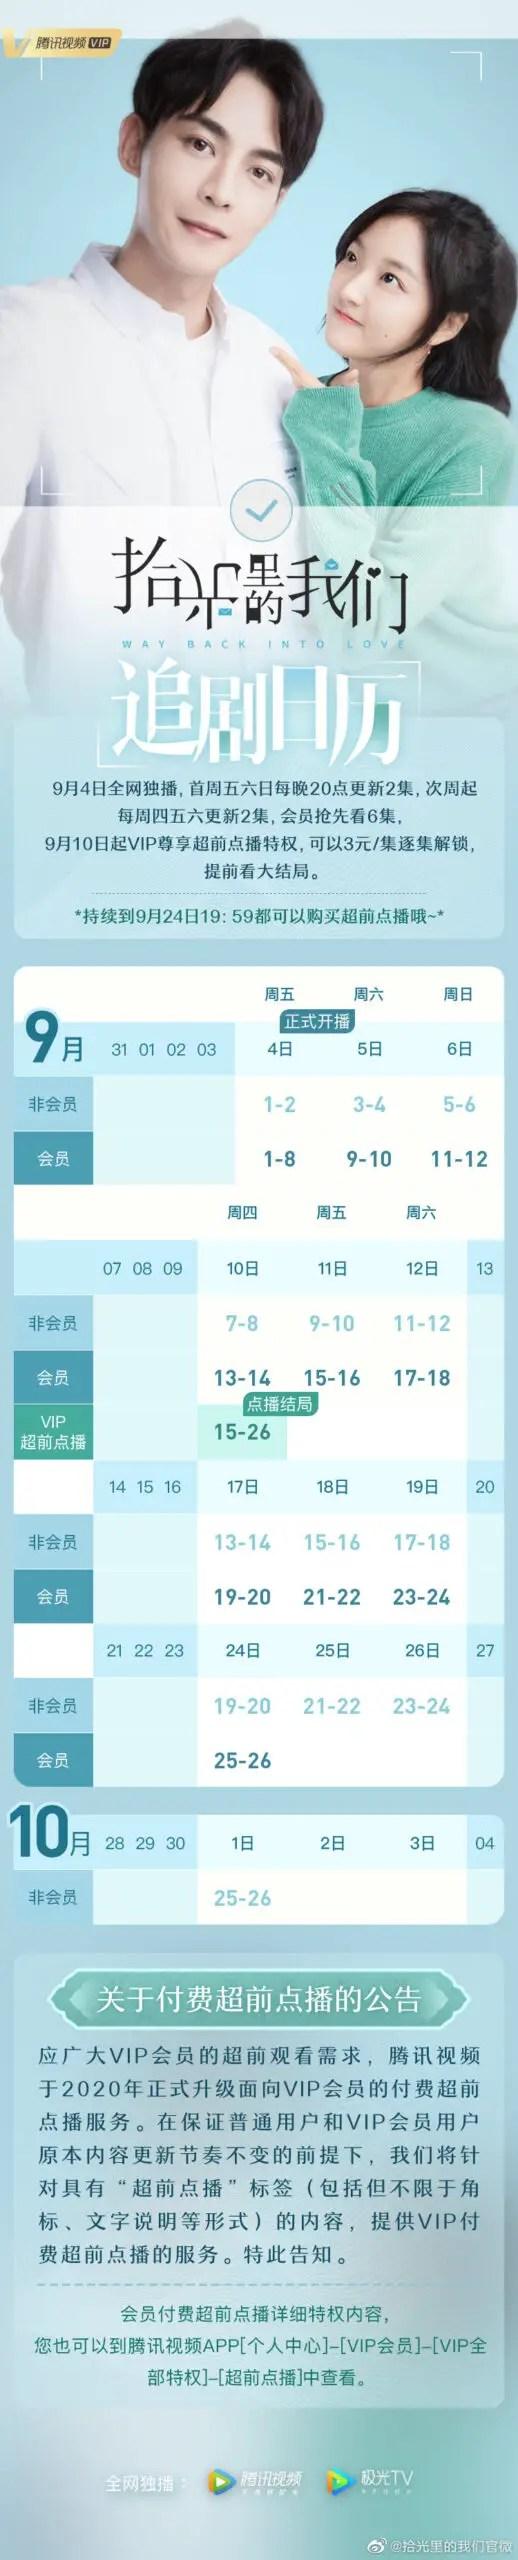 Way Back Into Love Chinese Drama Airing Calendar